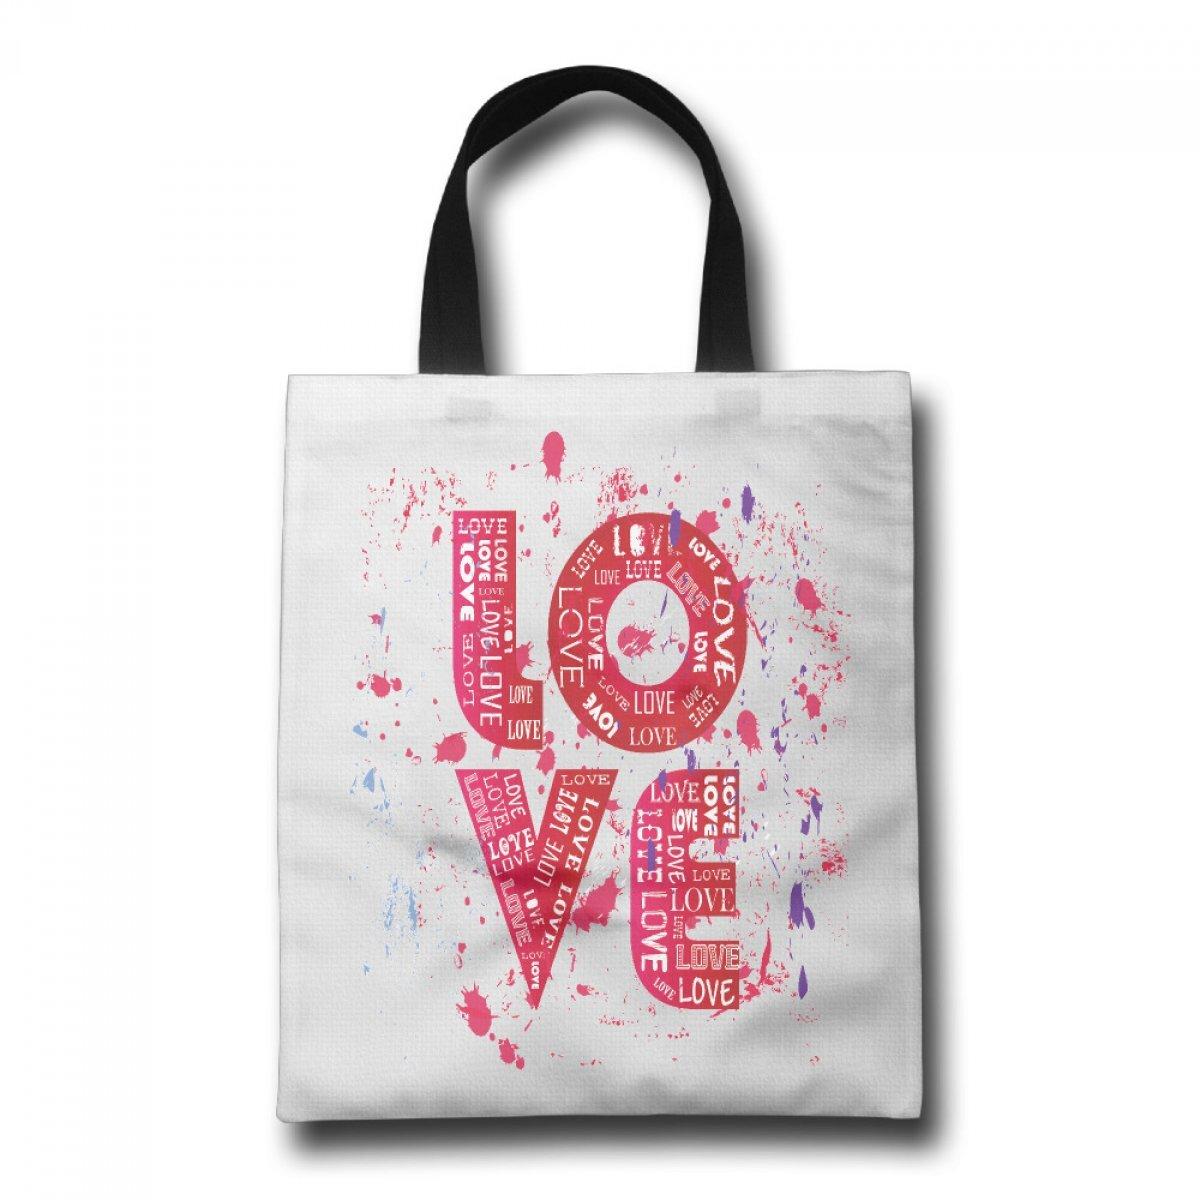 PhoRock Women Canvas Beach Tote LOVE Printed Tote Bag GWZM002 0